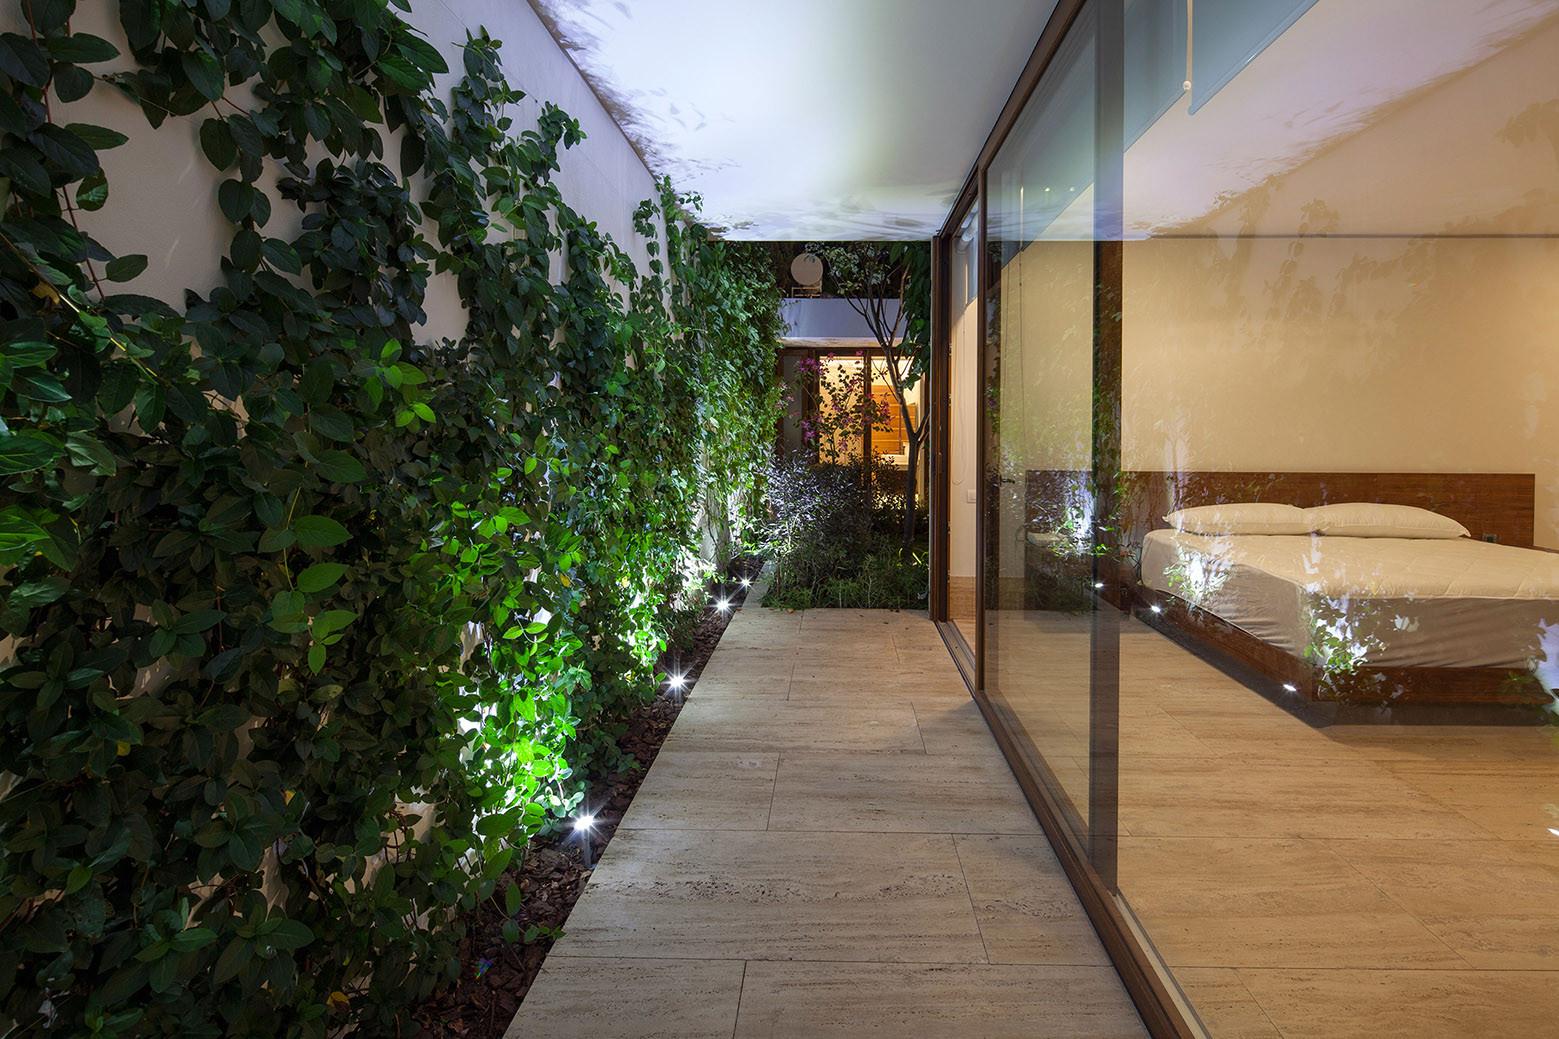 Gallery of 8 gardens house goko mx 4 - Casas con jardin interior ...